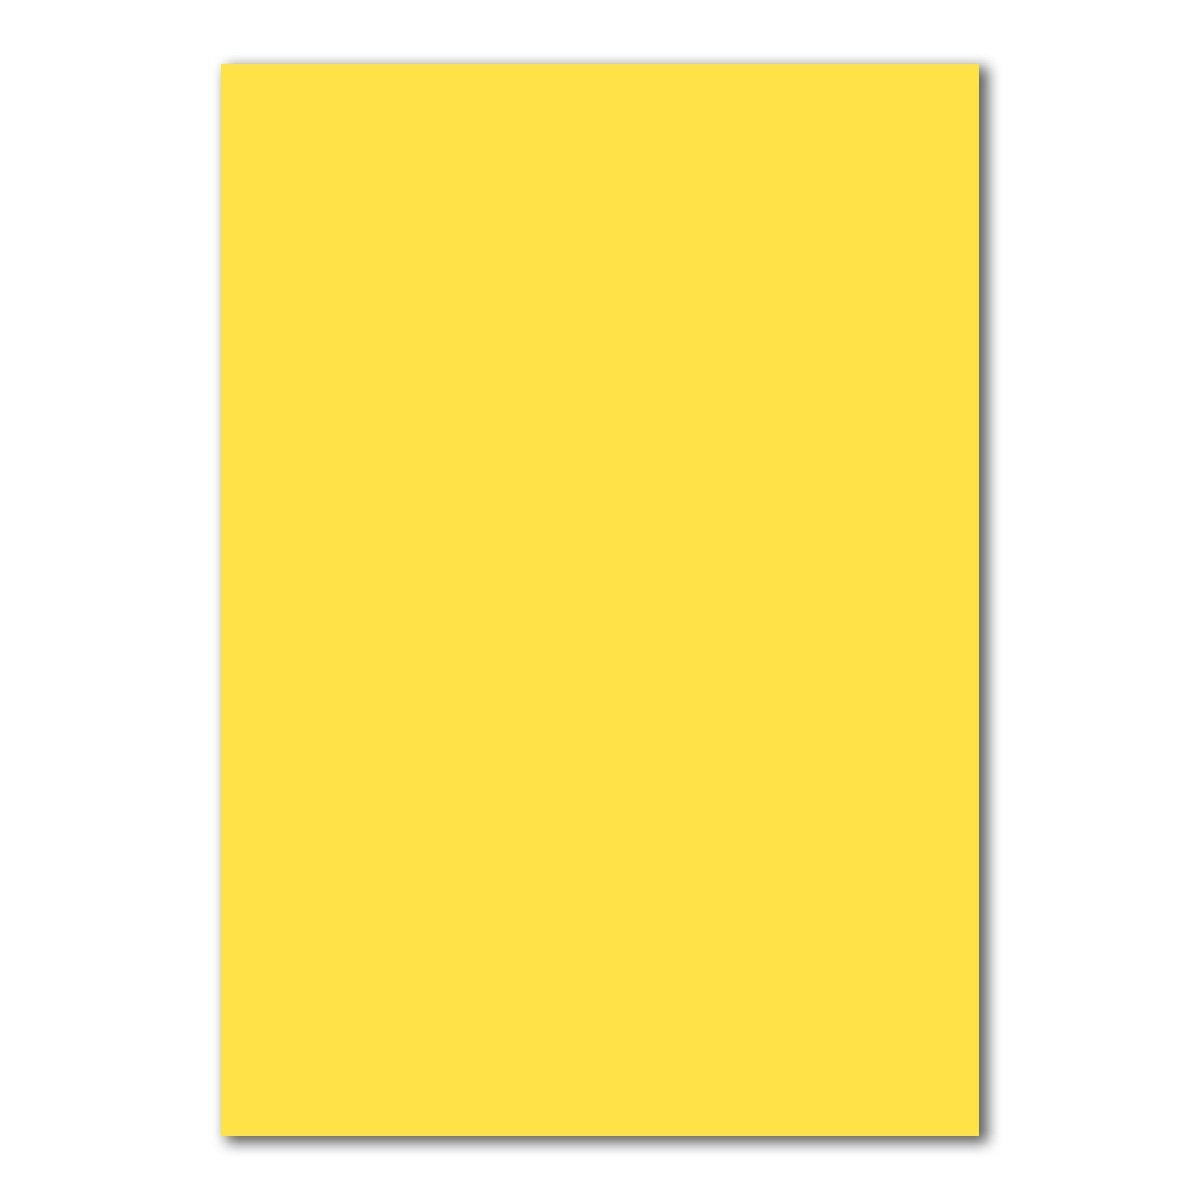 foglio in plano Gesamtparent Foglio di carta DIN A4 50 Blatt 10-Hochwei/ß 160/g//m/² FarbenFroh